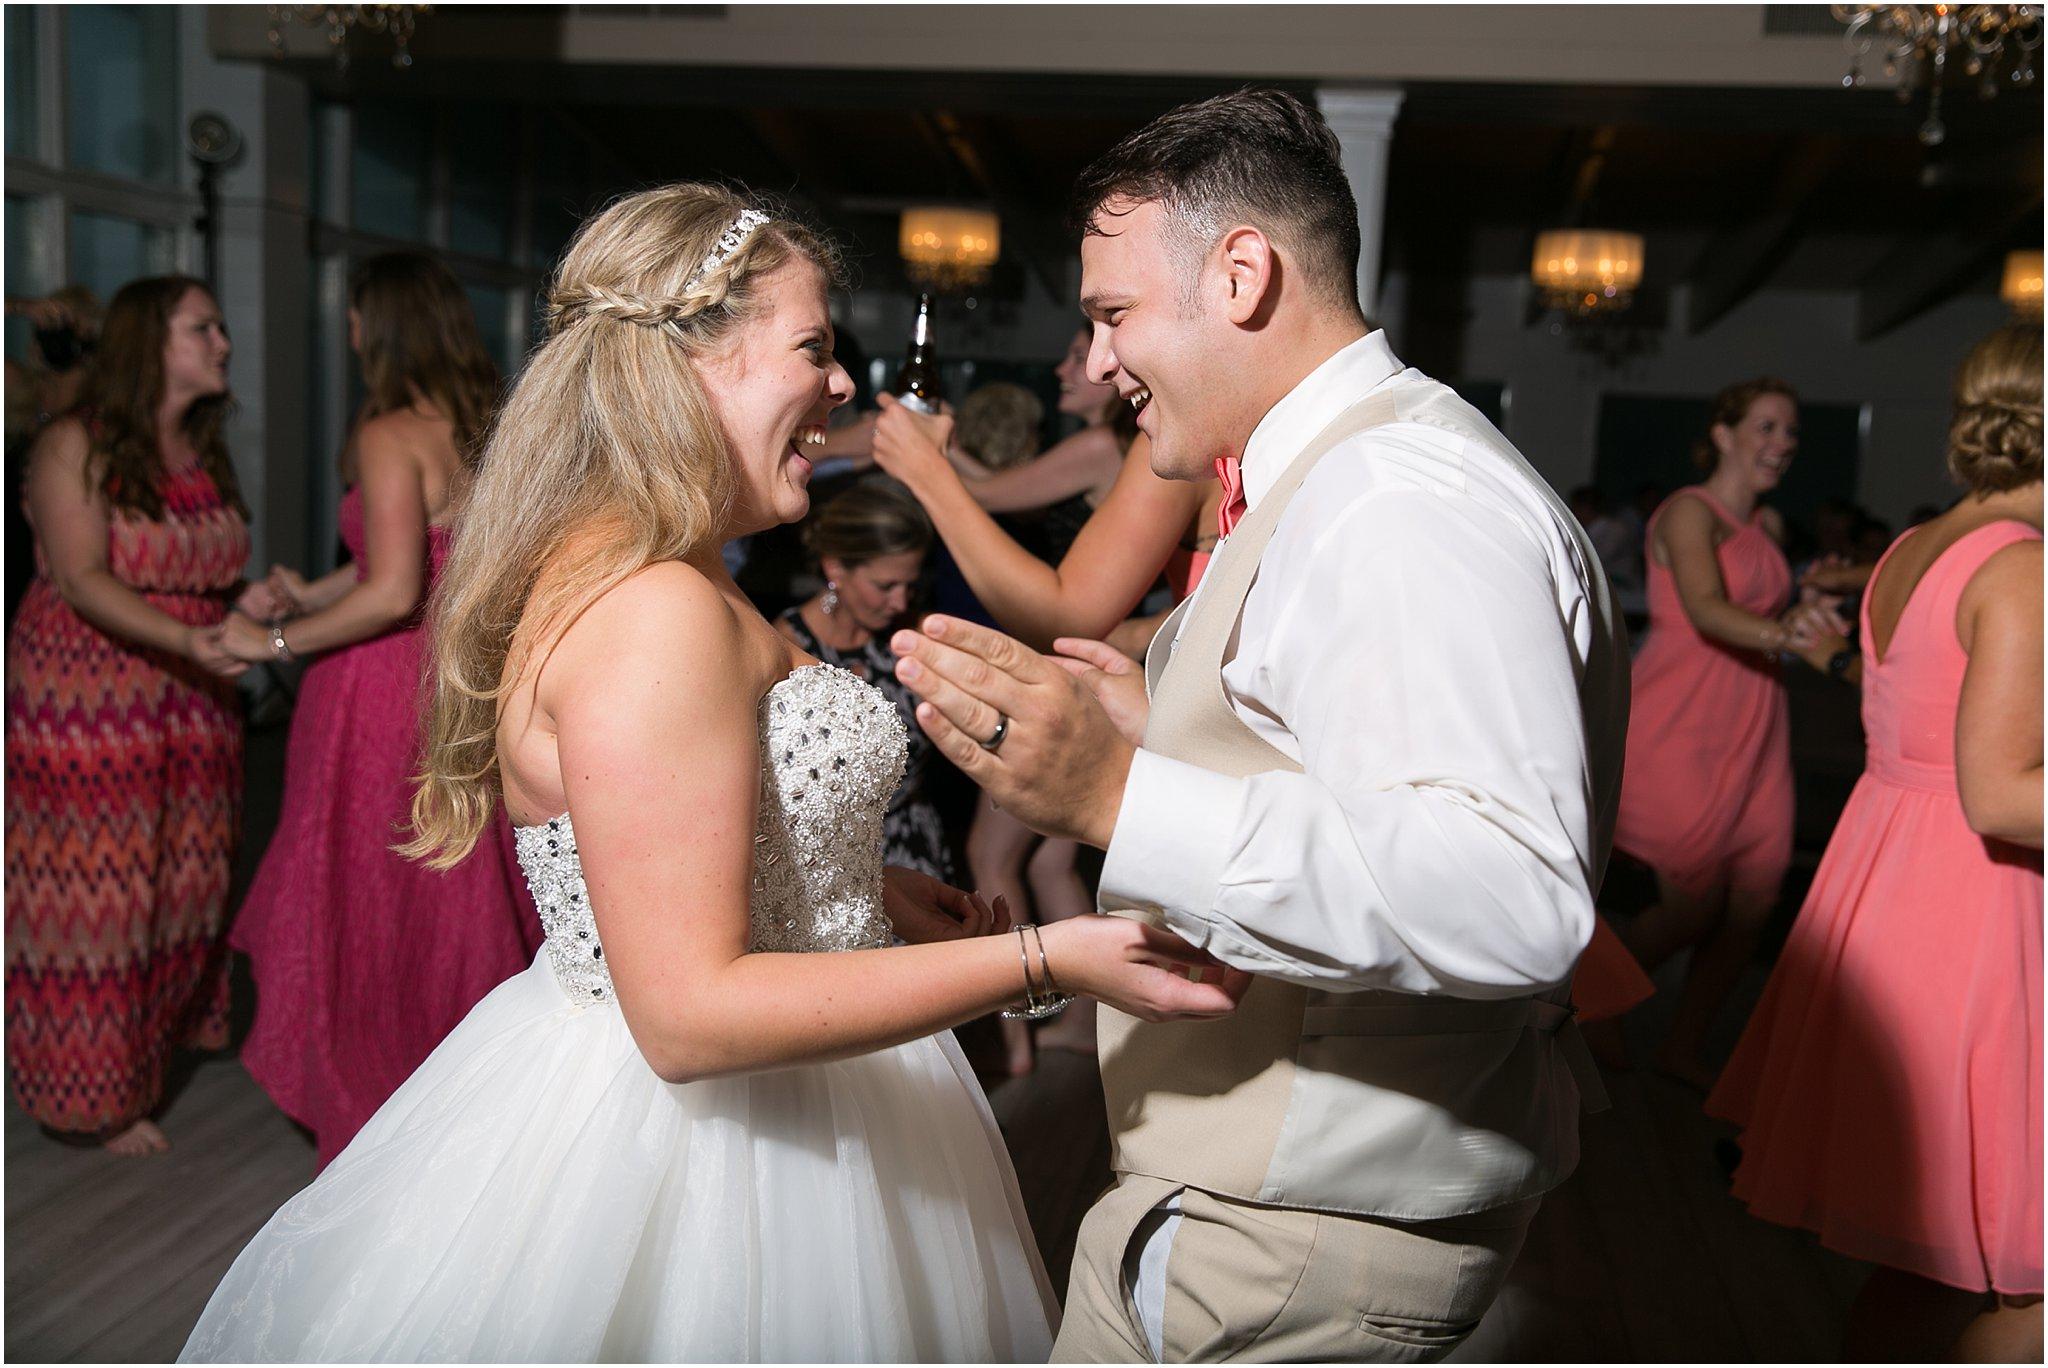 jessica_ryan_photography_wedding_hampton_roads_virginia_virginia_beach_weddings_0633